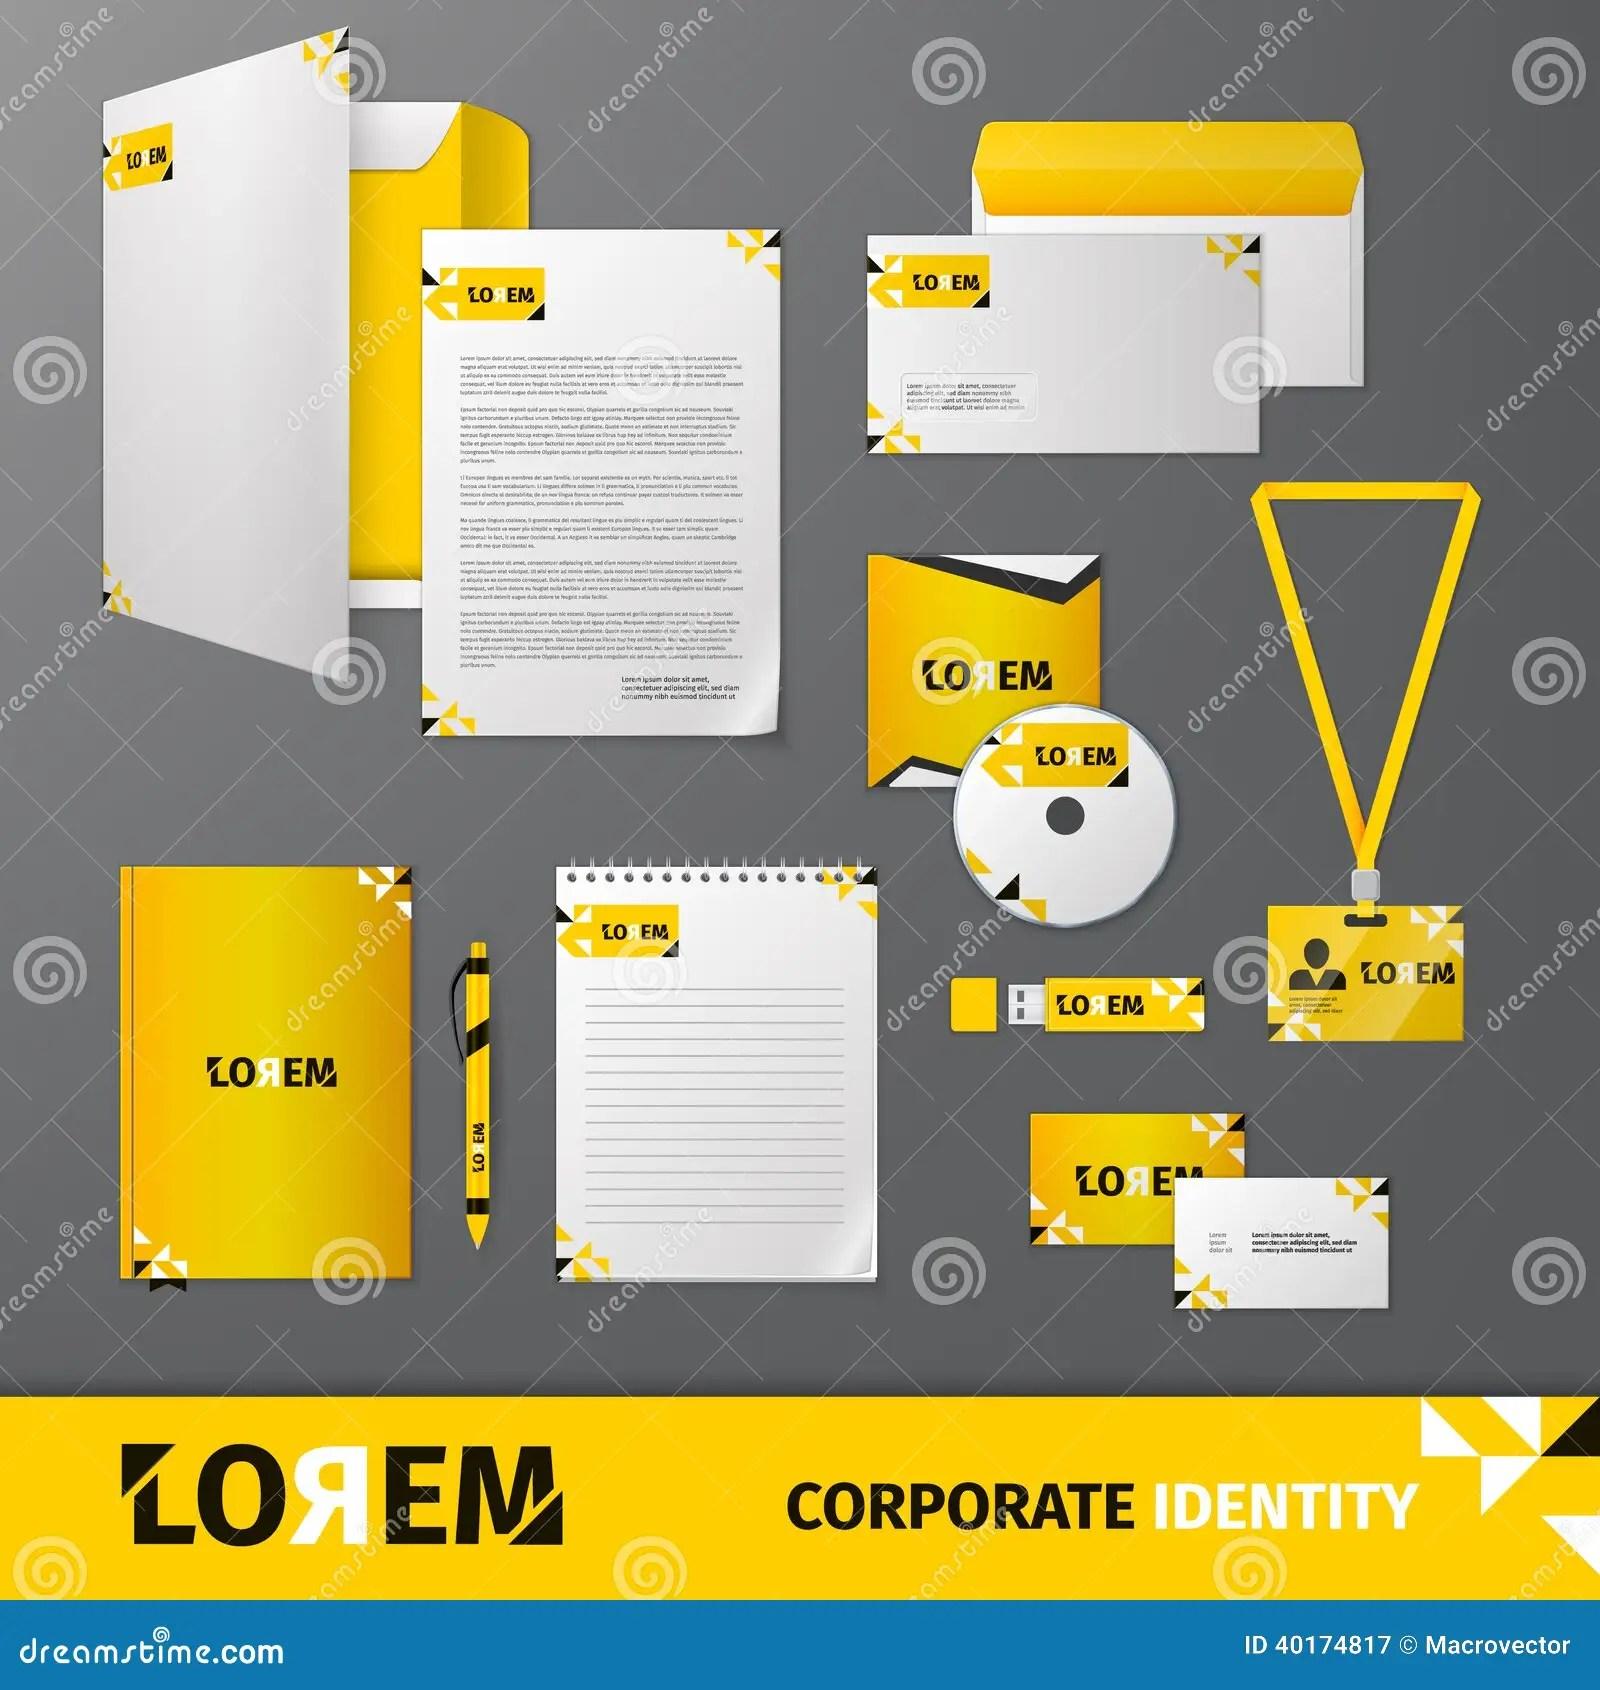 Corporate Identity Template Stock Vector Image 40174817